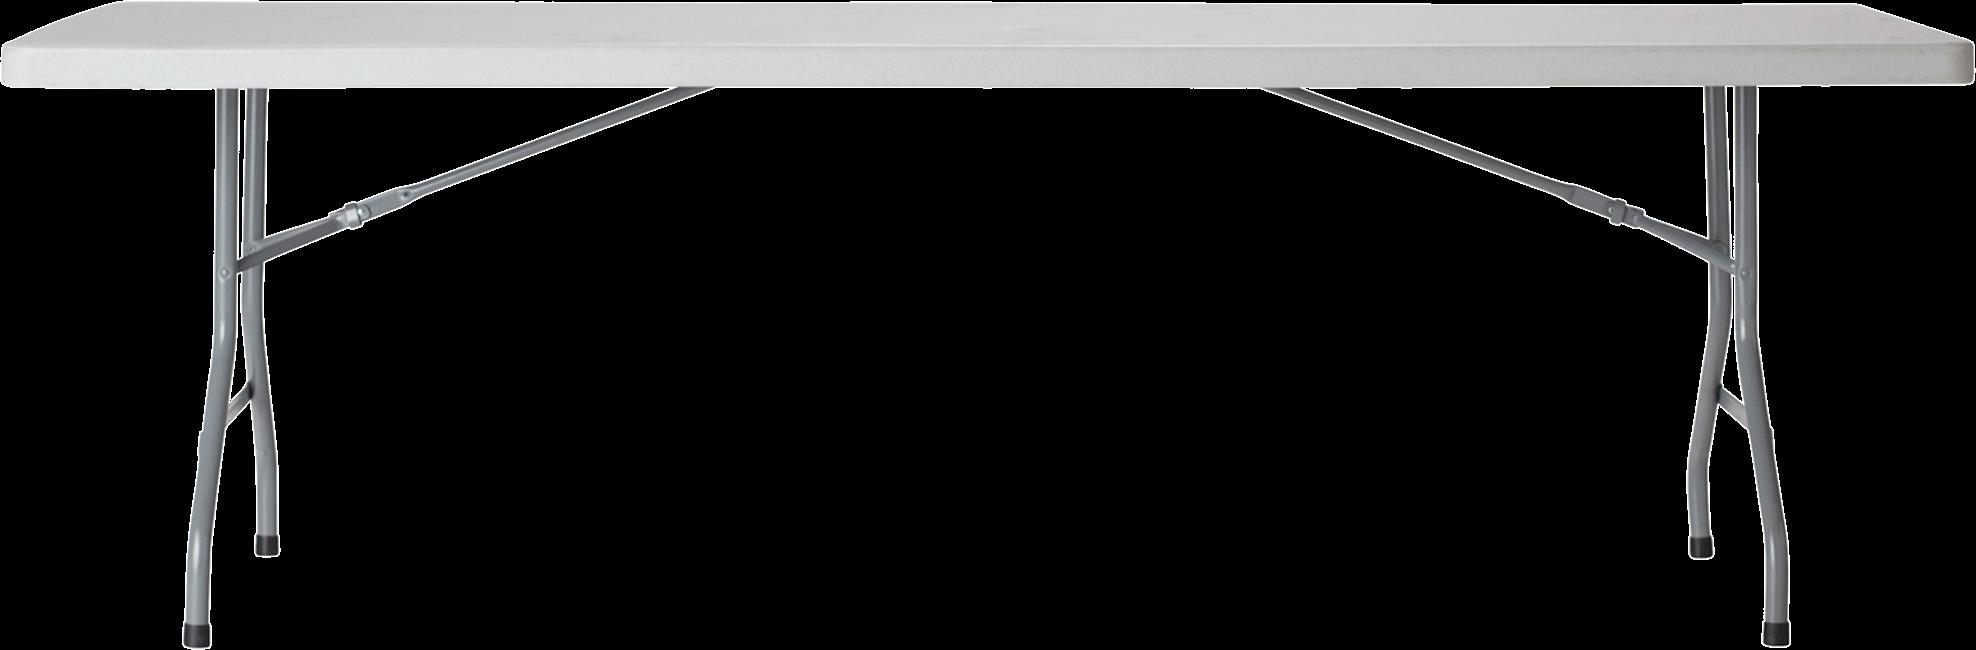 Trestle Table - Poly - 243 x 76cm Rect